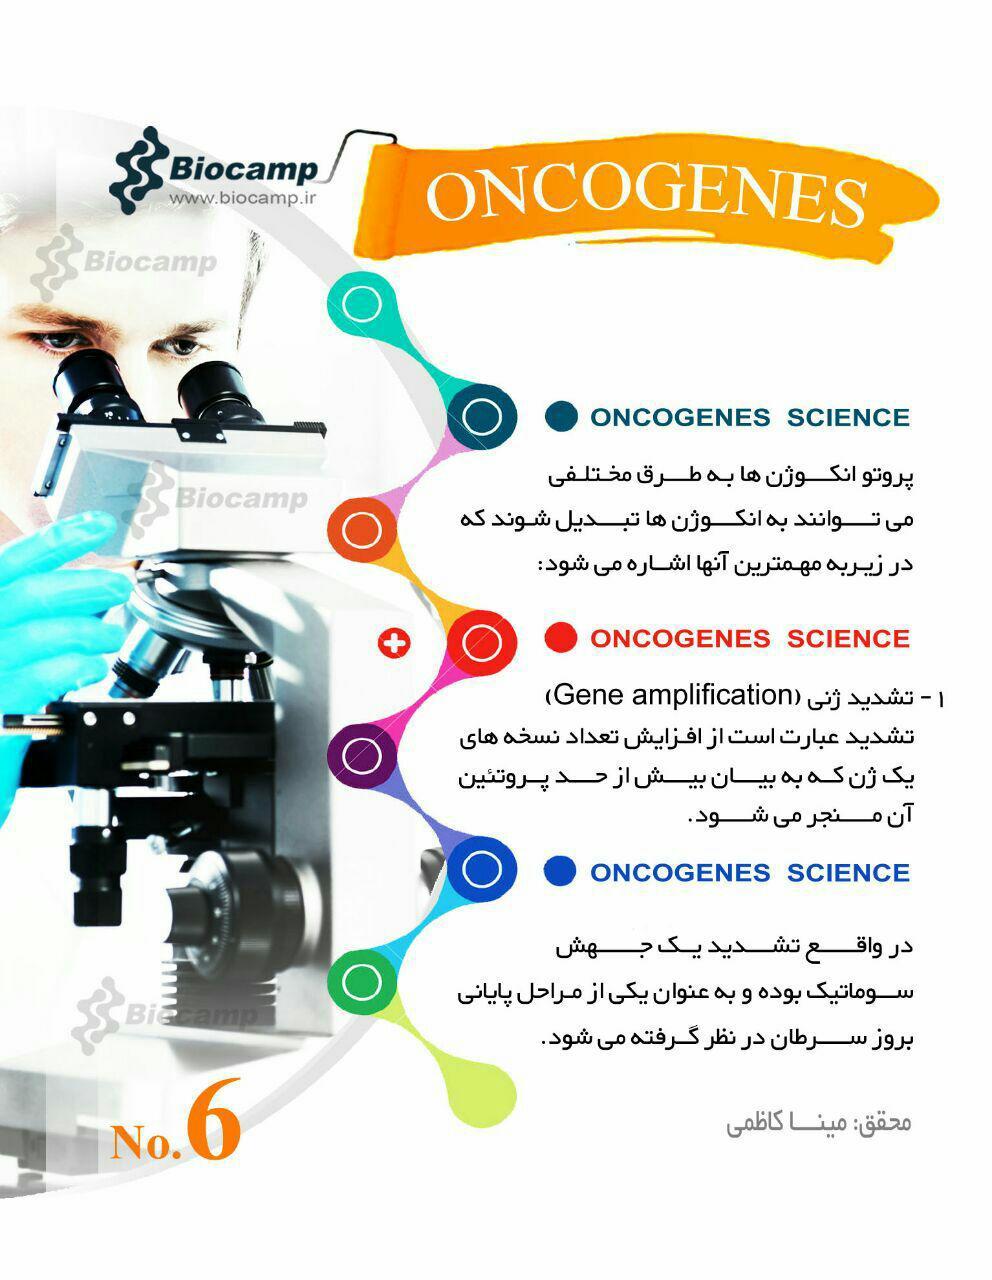 انکوژن انکوژن چیست؟ اینفوگرافی انکوژن چیست؟ اینفوگرافی photo 2016 09 12 21 16 20